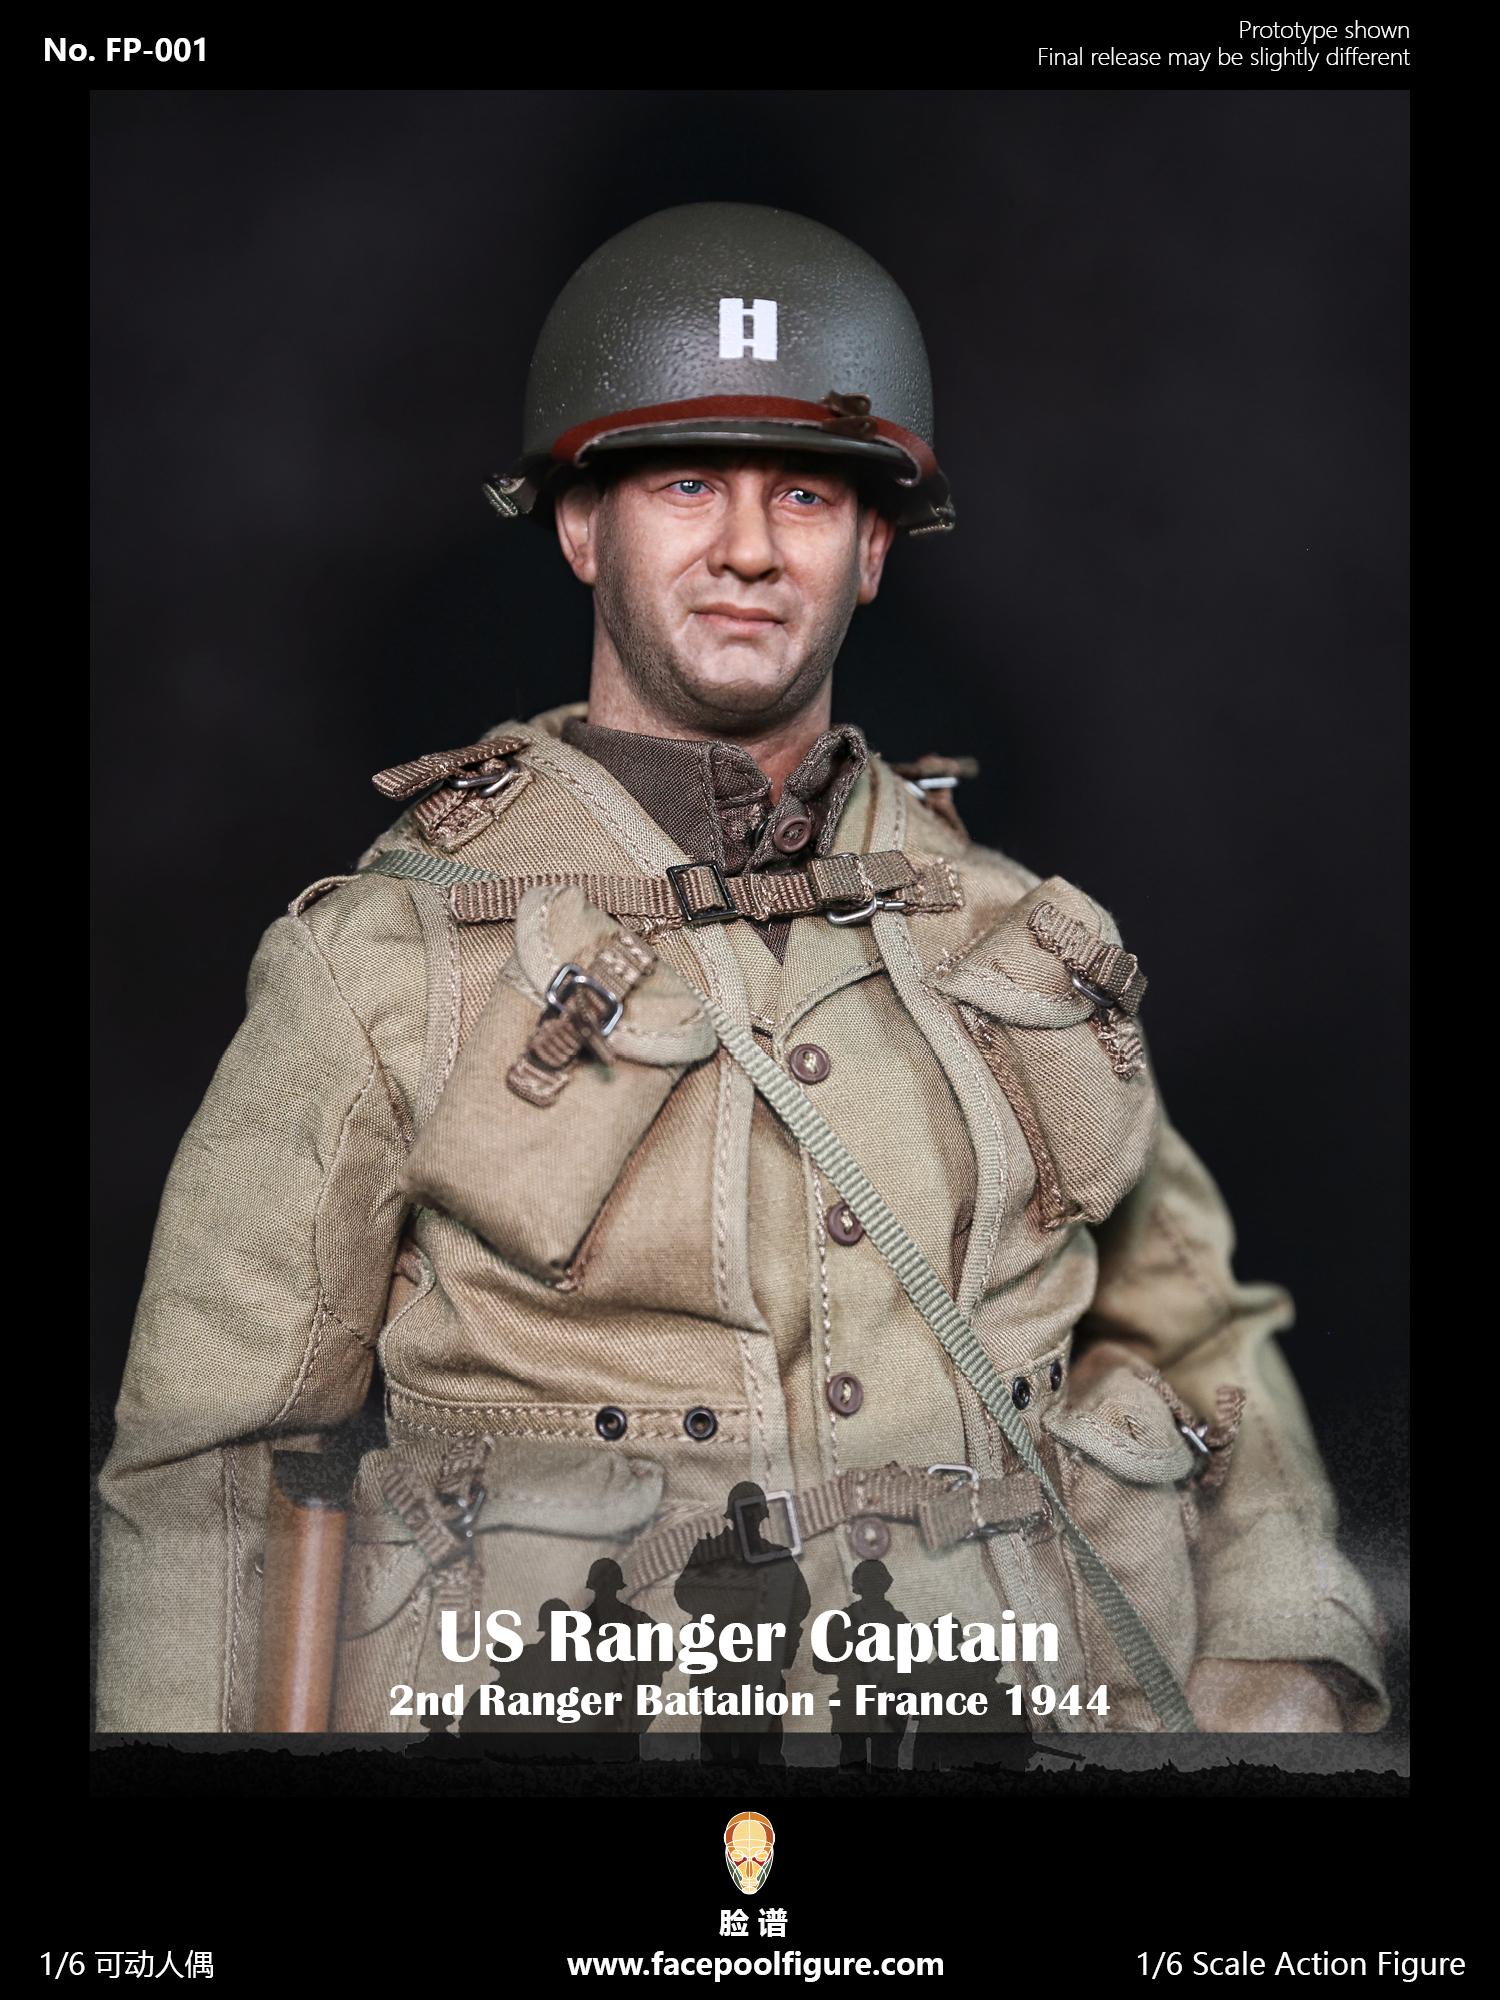 FP-001 Facepool figure 1/6 Action Figure - US Ranger